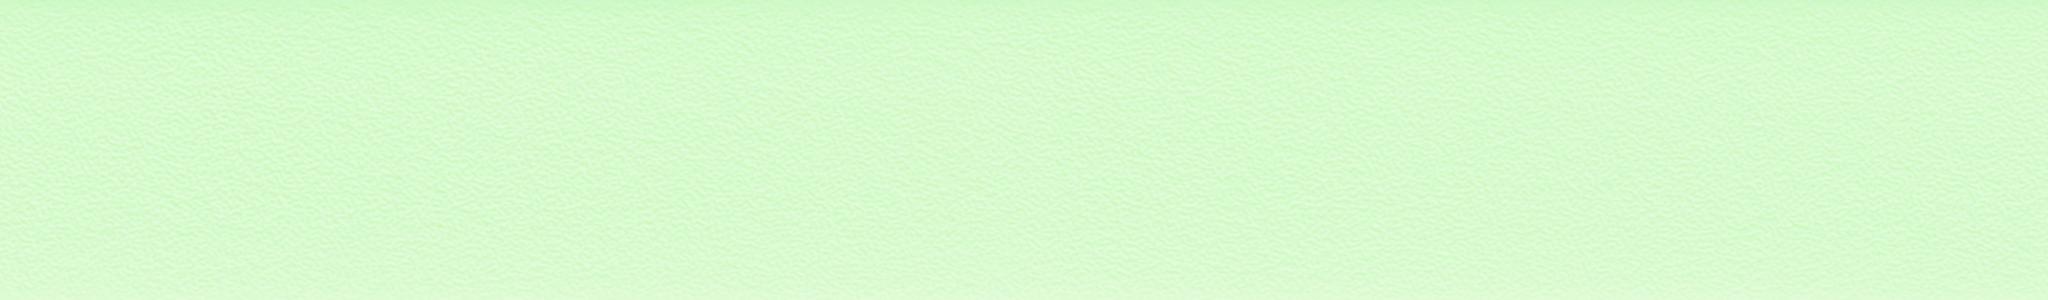 HU 16171 Chant ABS Vert Jade Perle 101